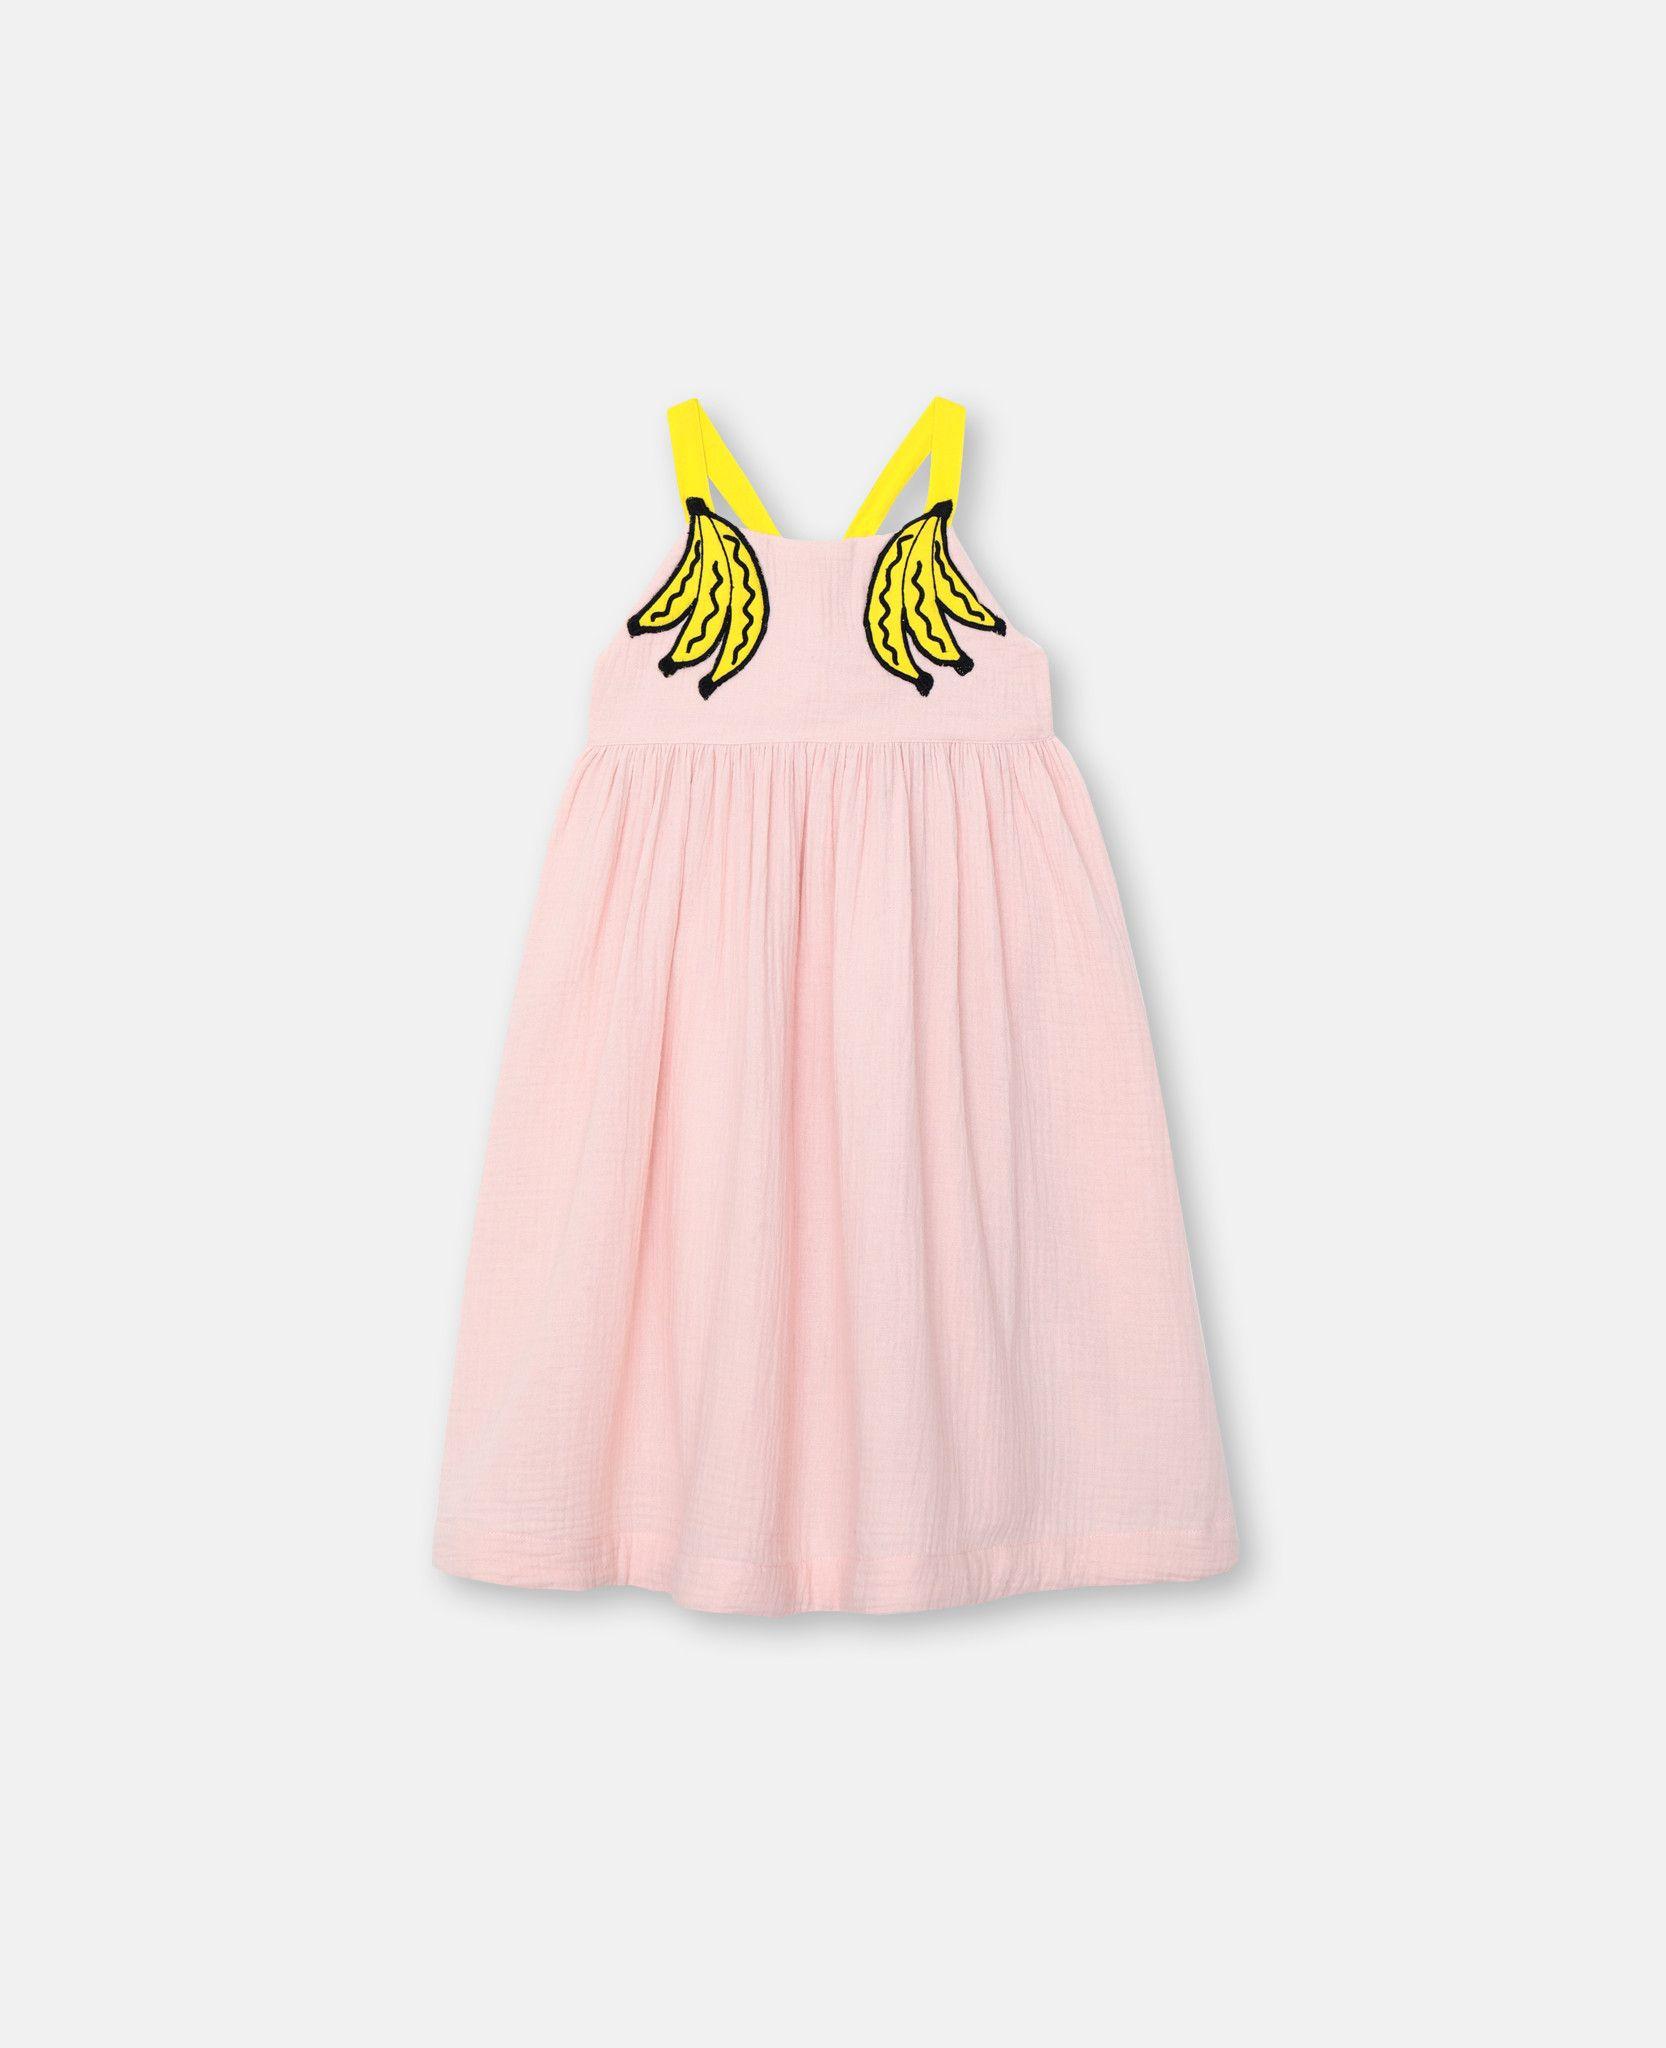 539b3461486d9 Banana Patch Dress - STELLA MCCARTNEY KIDS   kid style - for girls ...